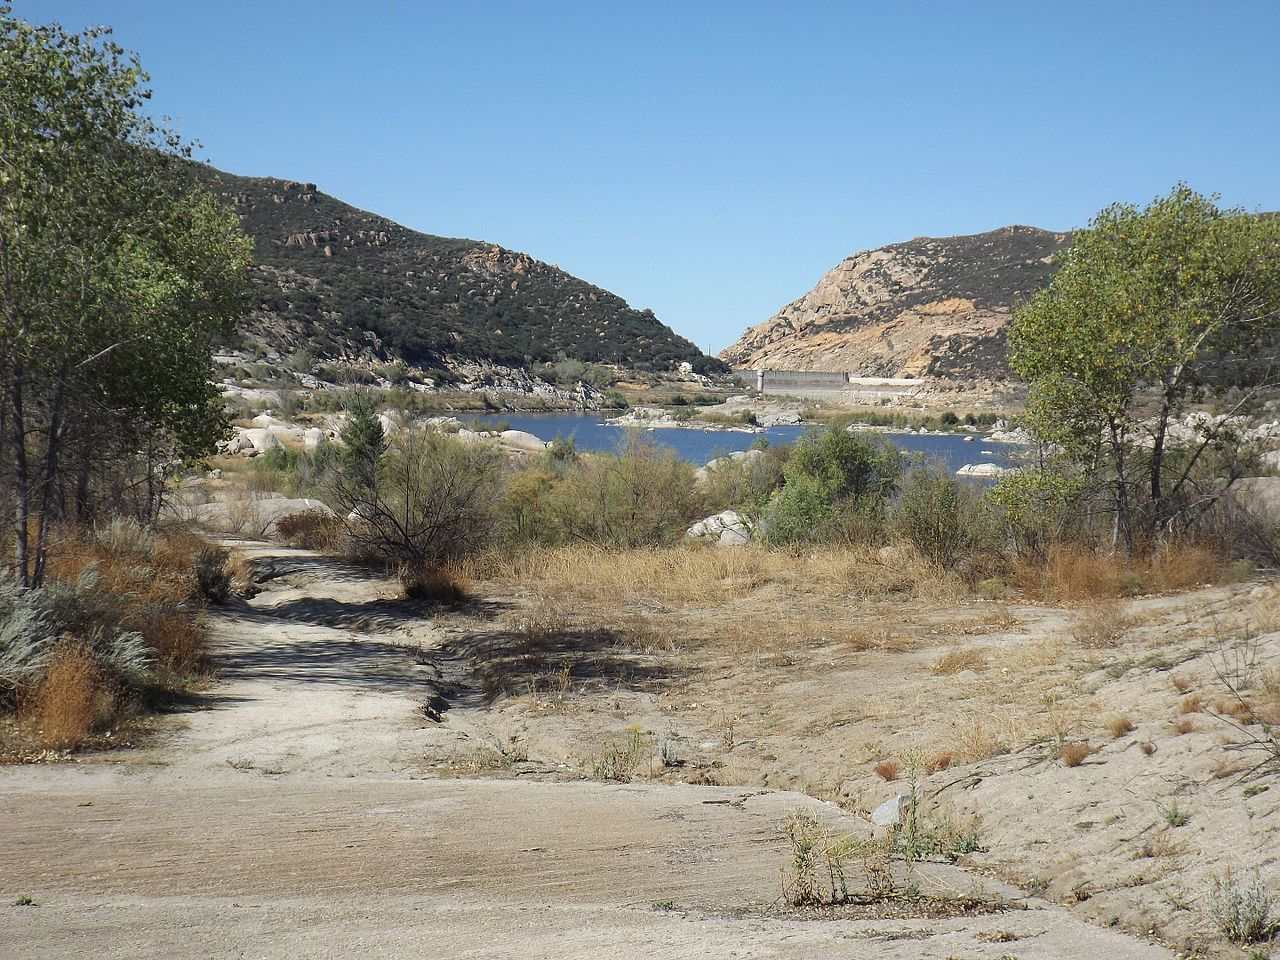 Lake Morena - Explore This Best Lake Of San Diego City